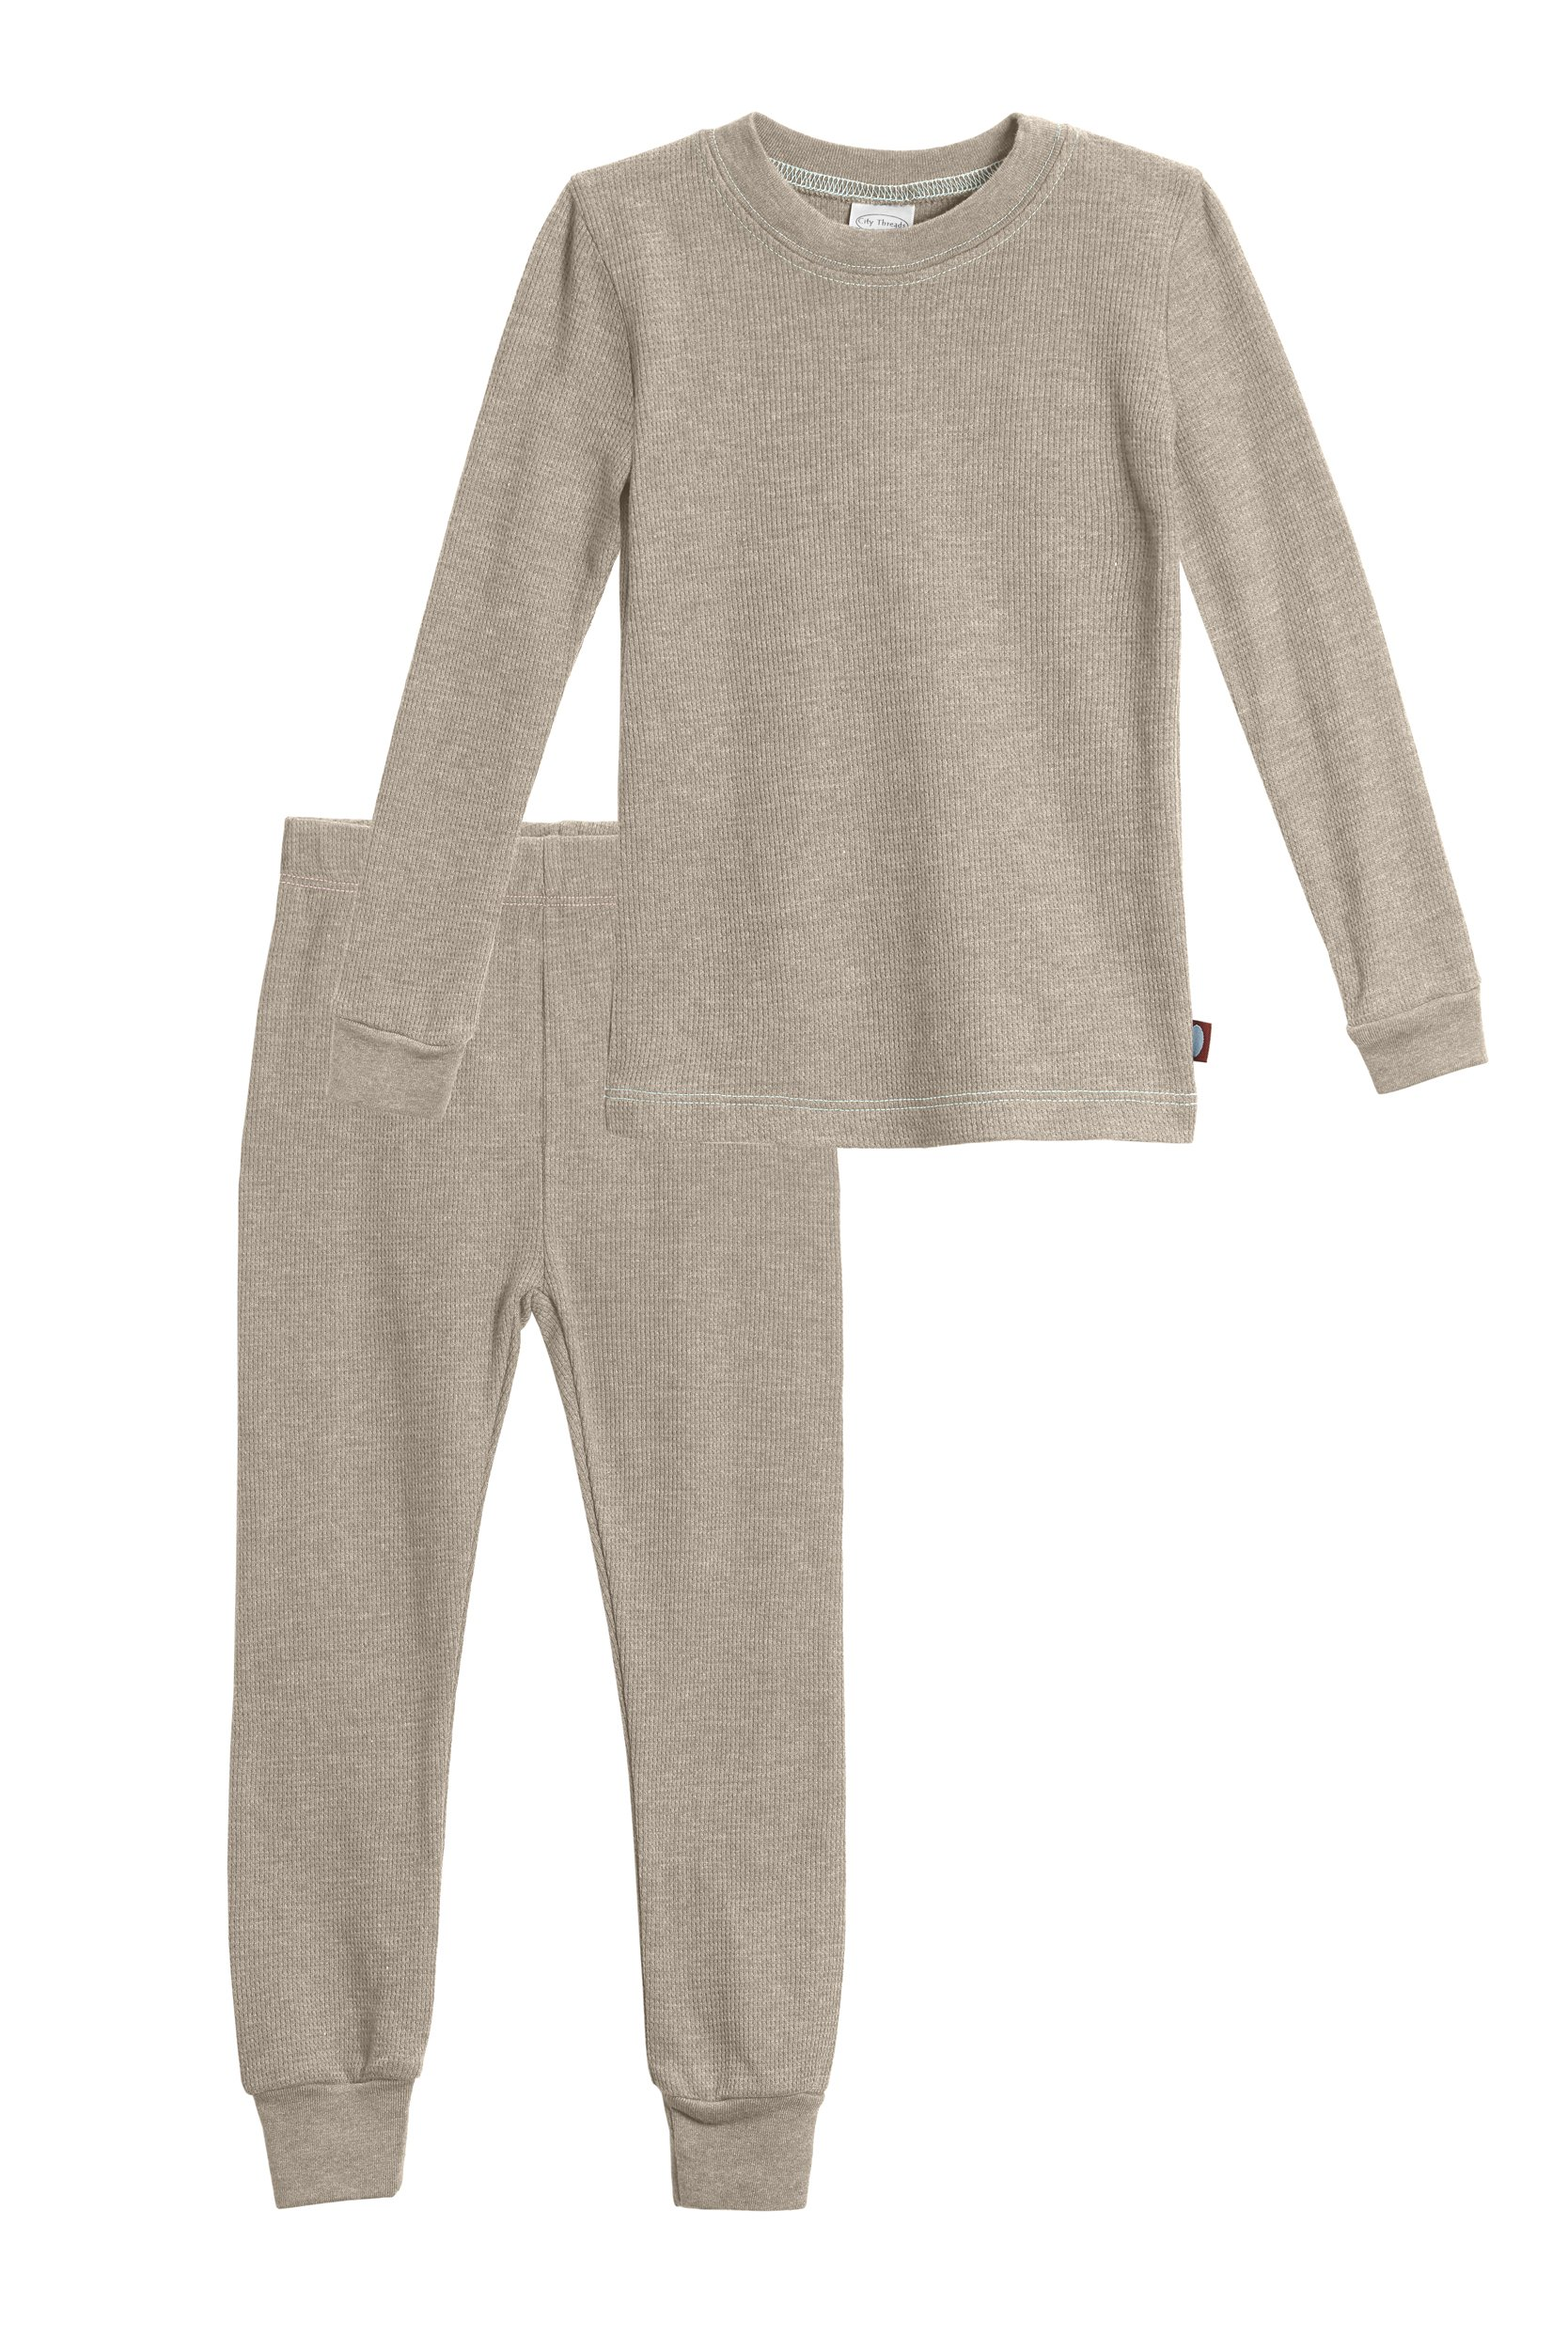 City Threads Big Boys Thermal Underwear Set Perfect For Sensitive Skin SPD Sensory Friendly, Dark Khaki, 8 by City Threads